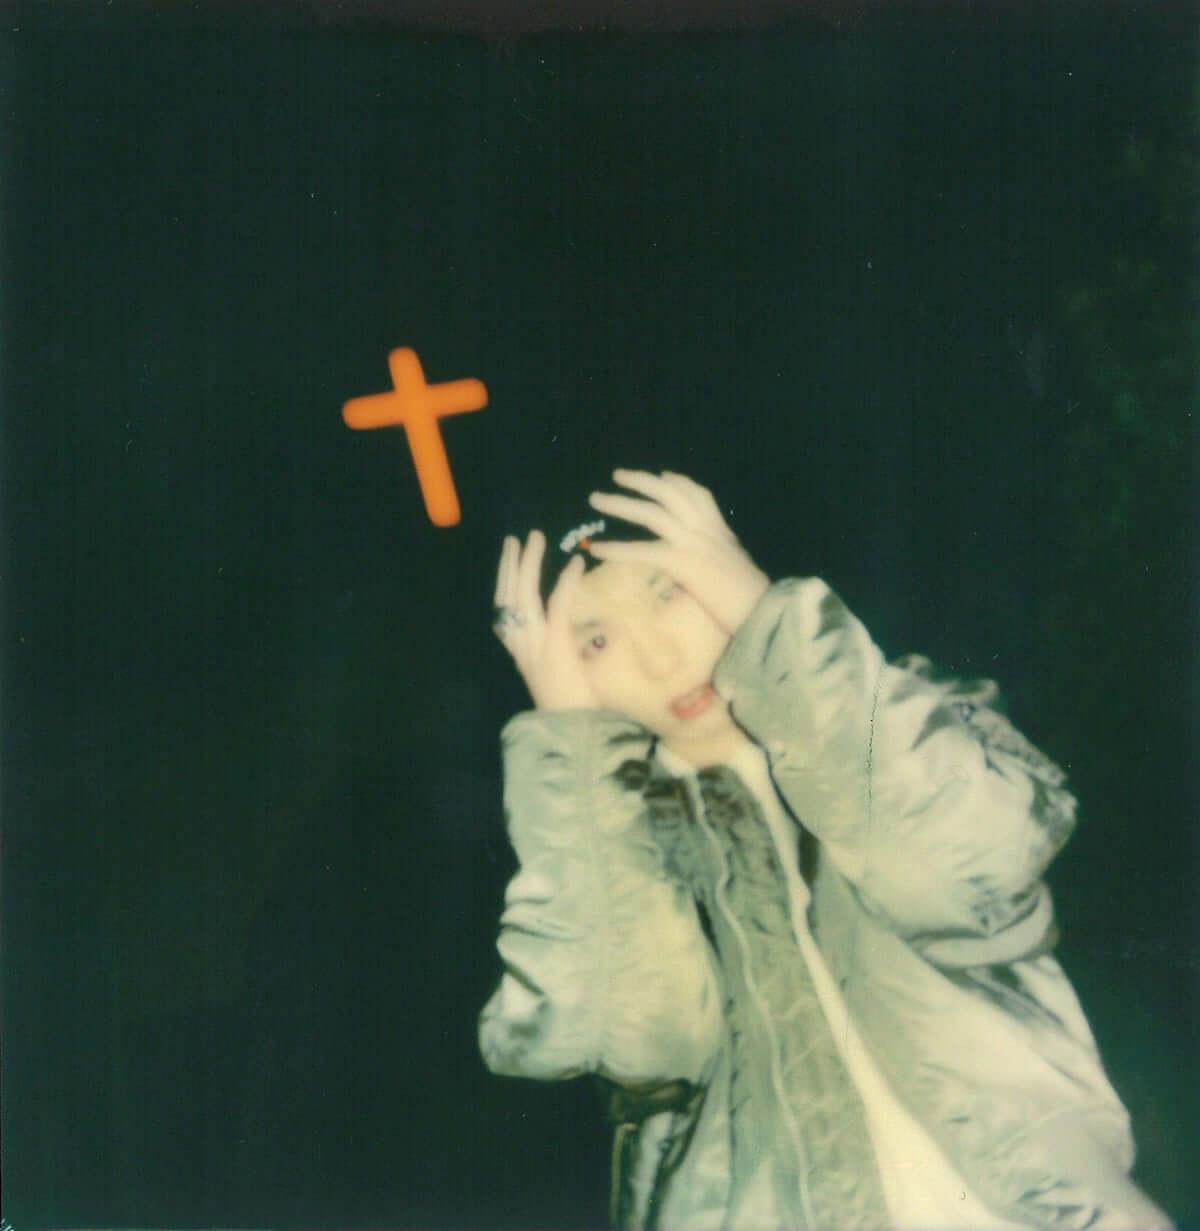 Kvi Baba、SALUを迎えた新曲2nd EP『19』収録曲「A Bright」のMVを公開 music190308-kvibaba-2-1200x1231